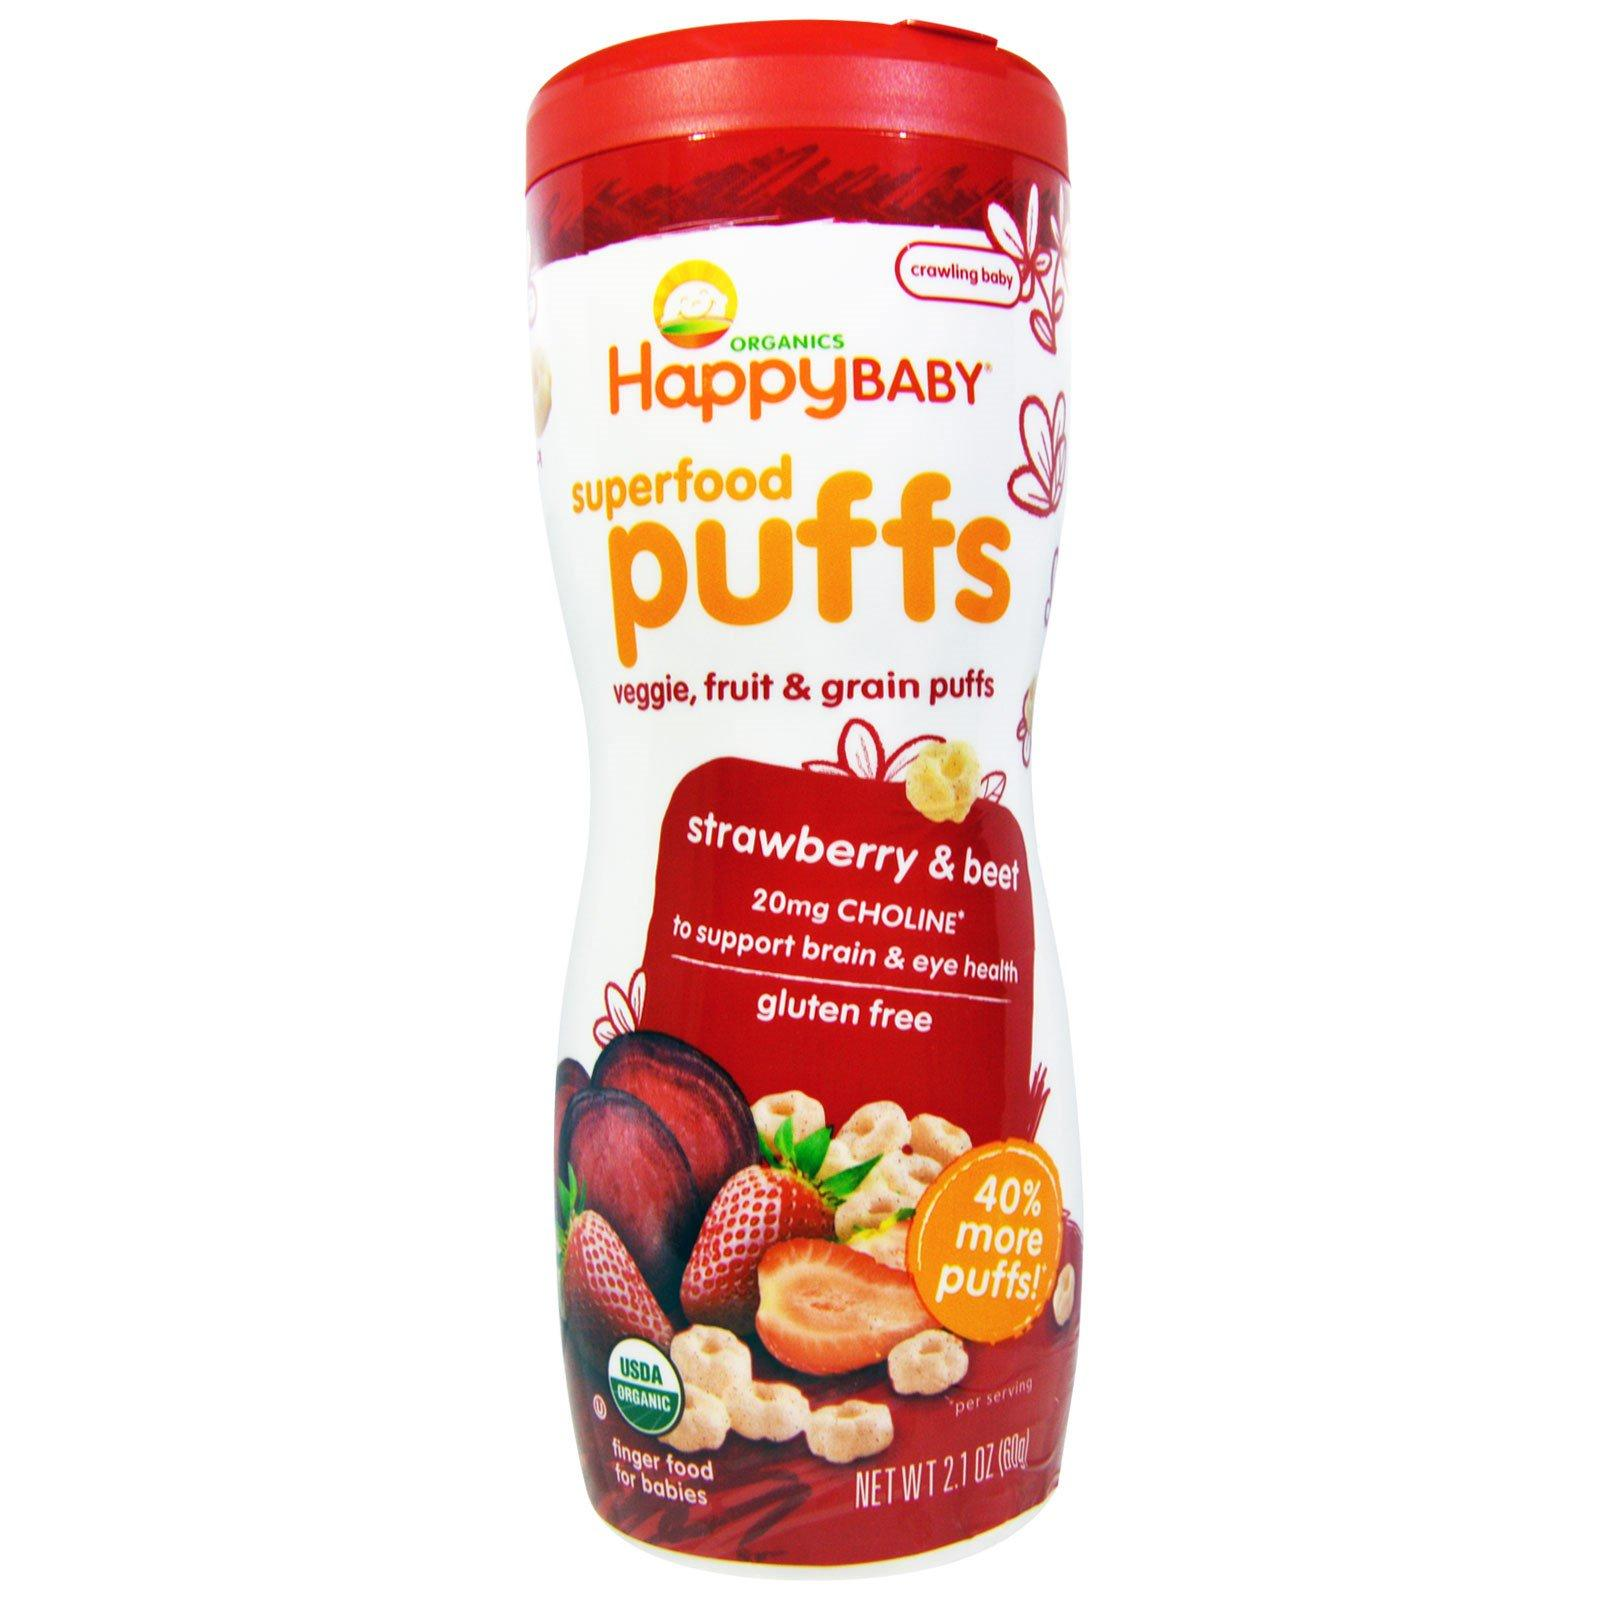 Happy Baby Organic Superfood Puffs Strawberry & Beet By Munckin Organics.